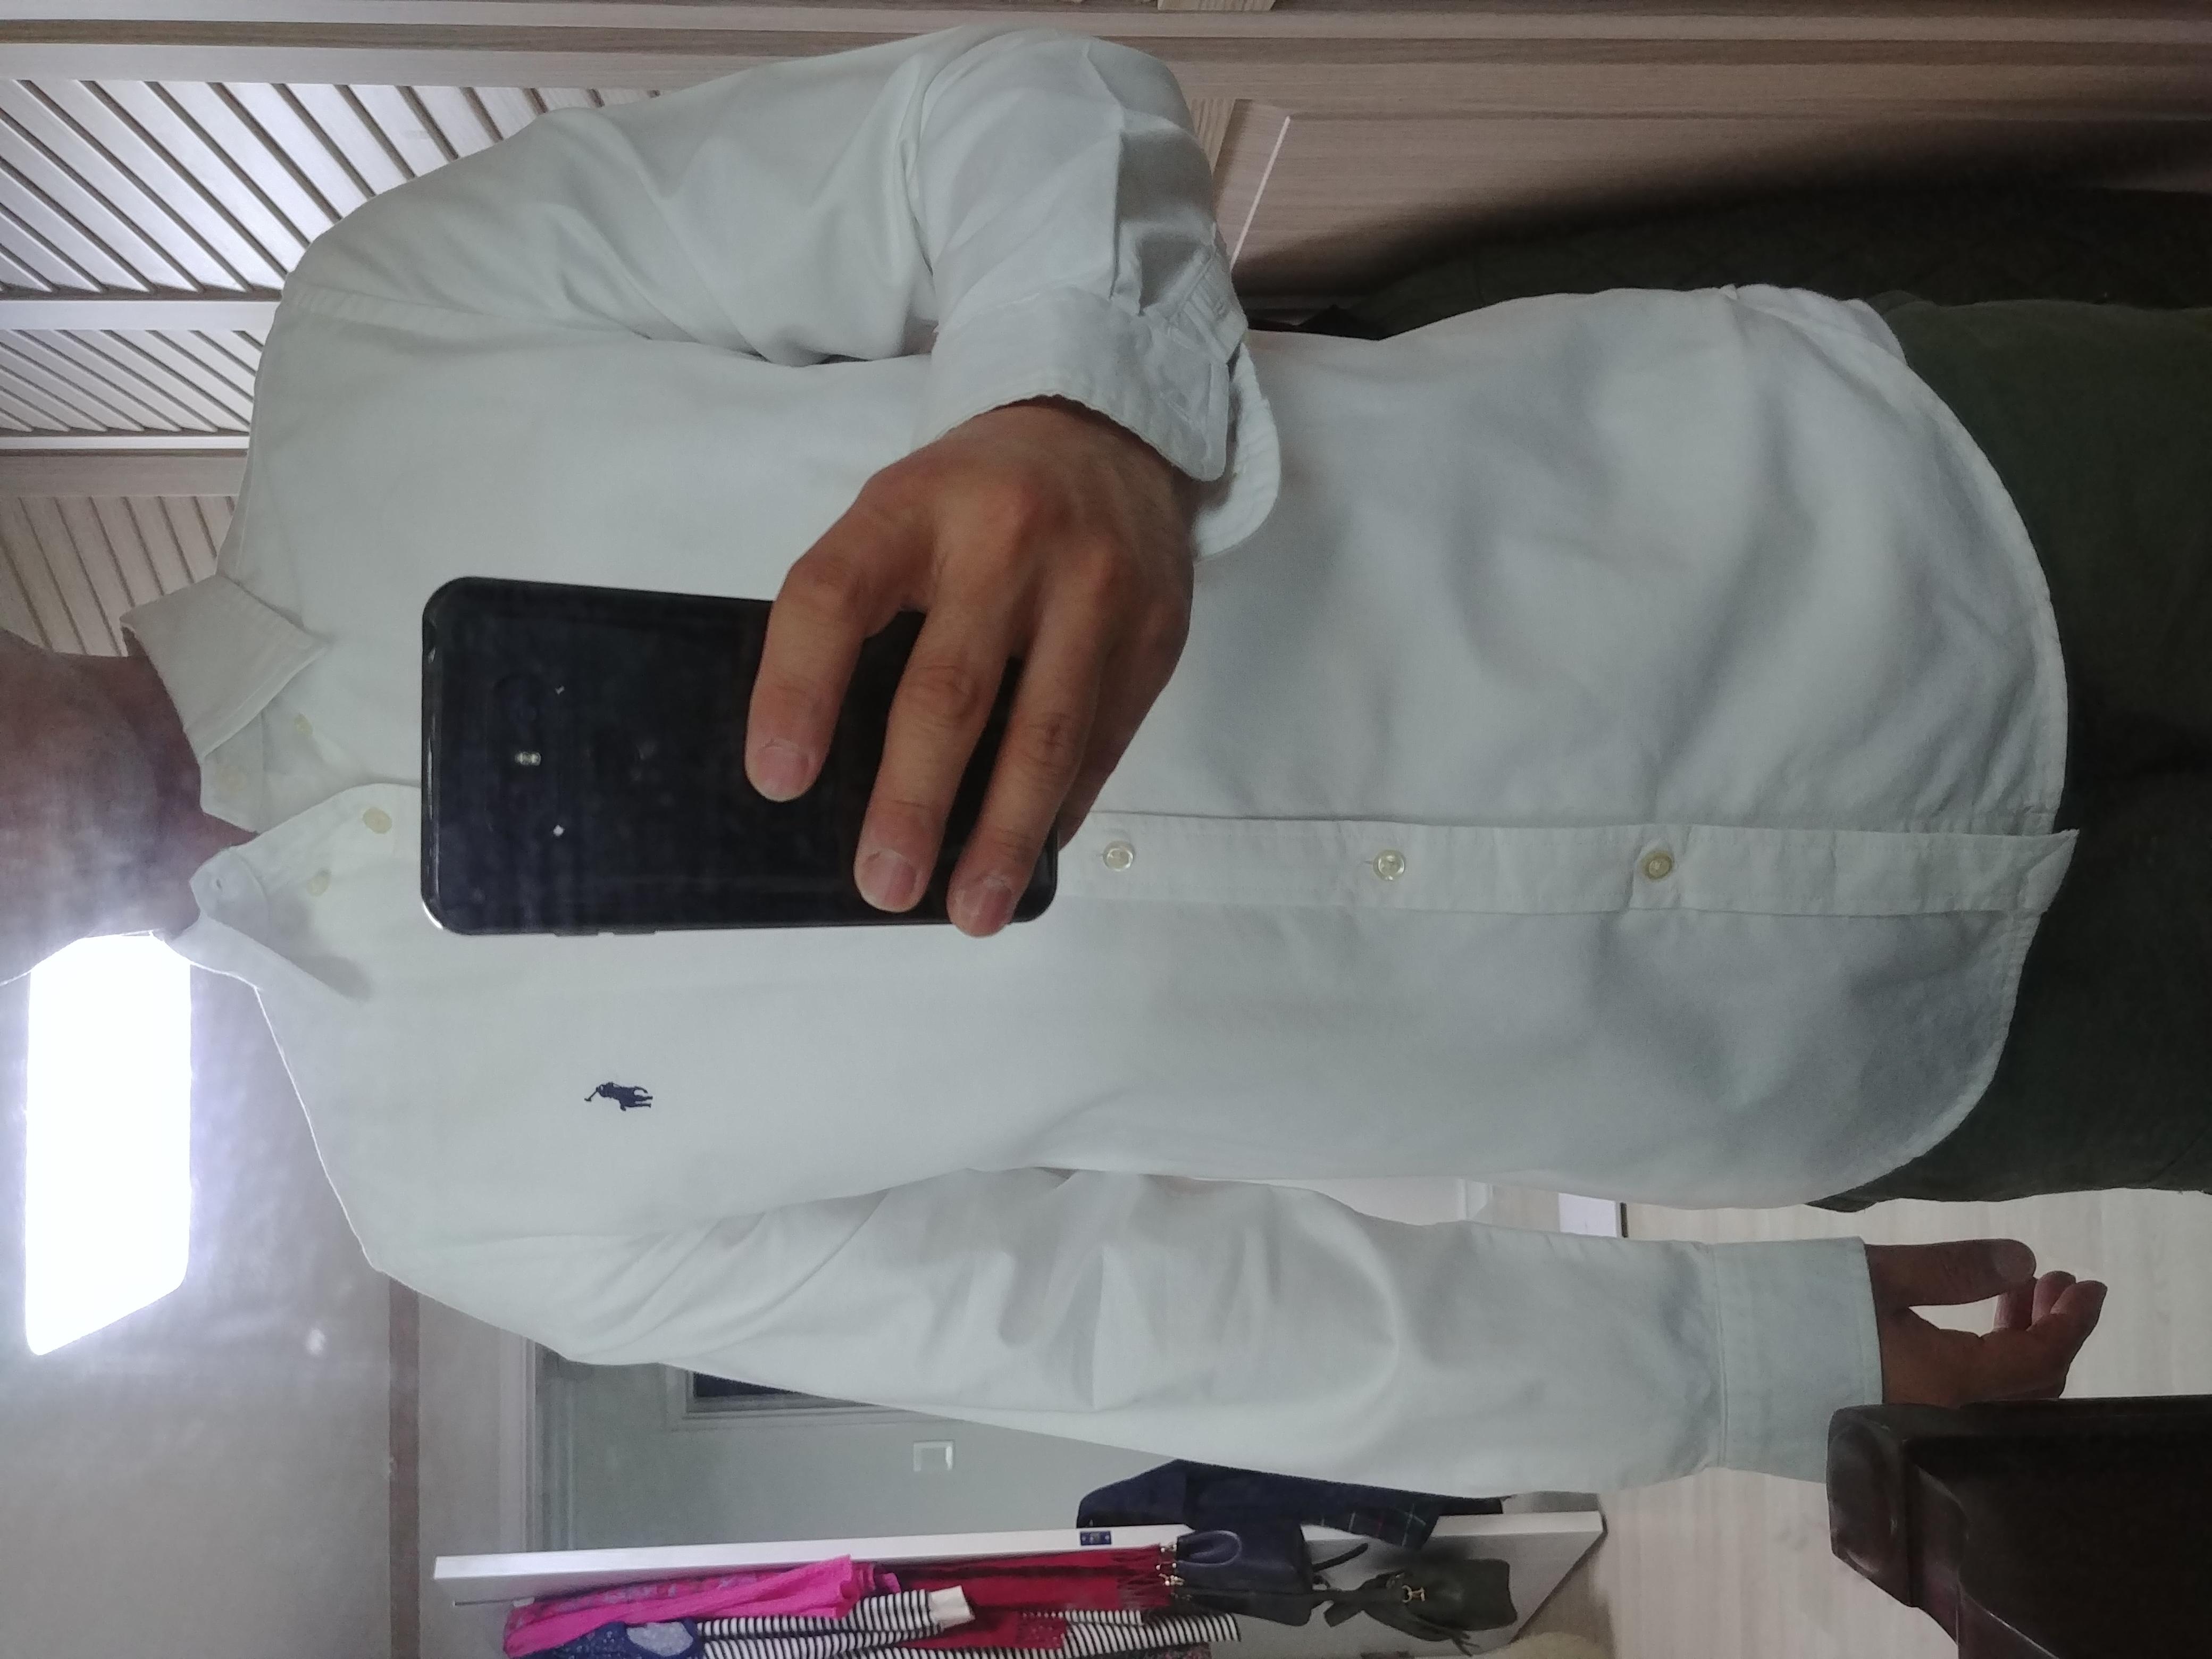 Tony Perotti Sandals Evan Brown Cokelat Tua 40 Size Xl